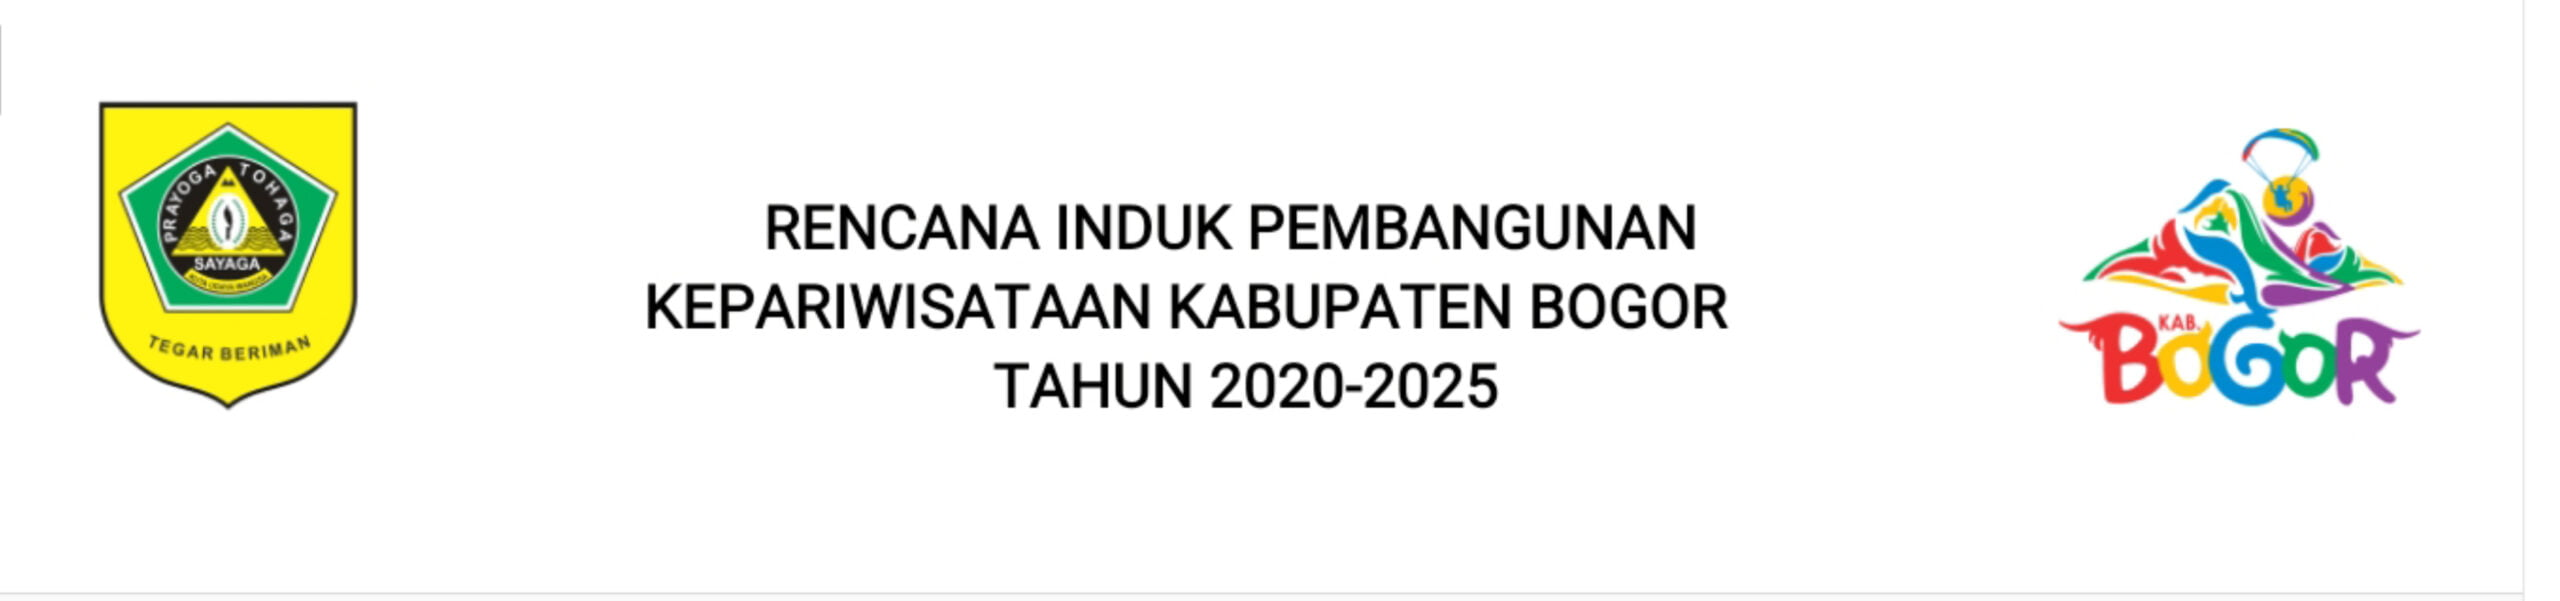 Rencana Induk Pembangunan Kepariwisataan Kabupaten Bogor Tahun 2020-2025 231